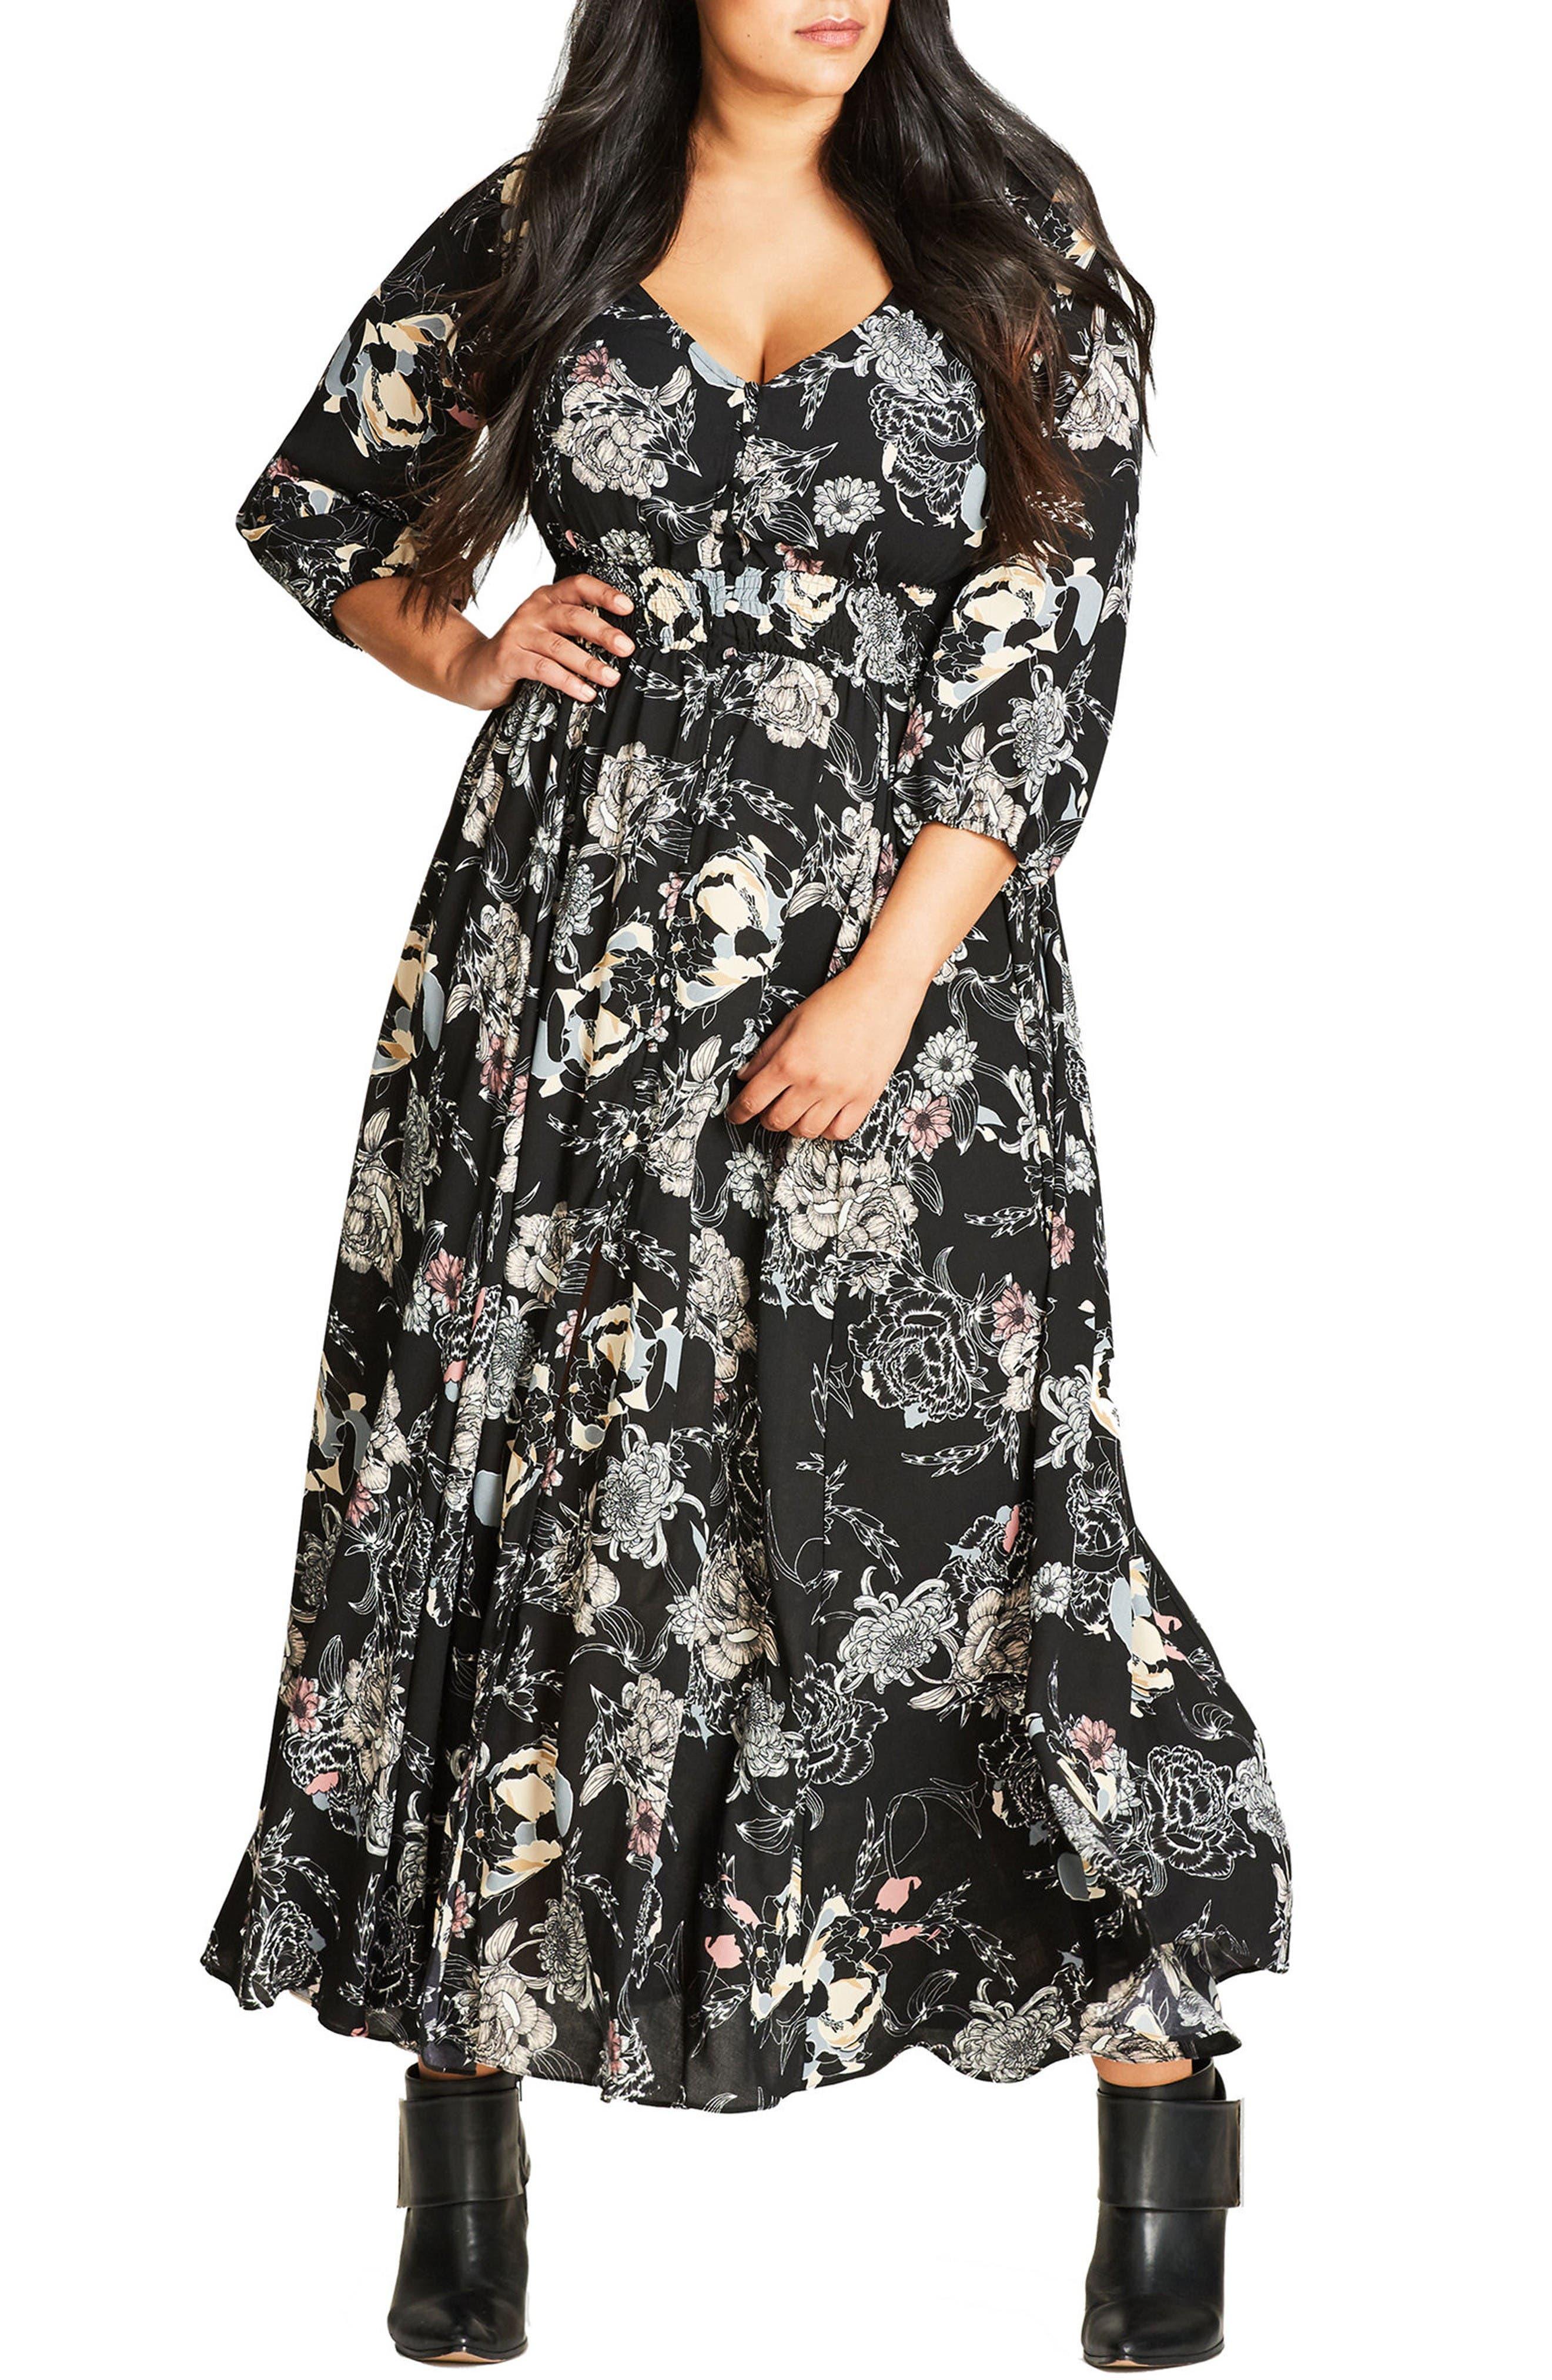 CITY CHIC Lush Floral Maxi Dress